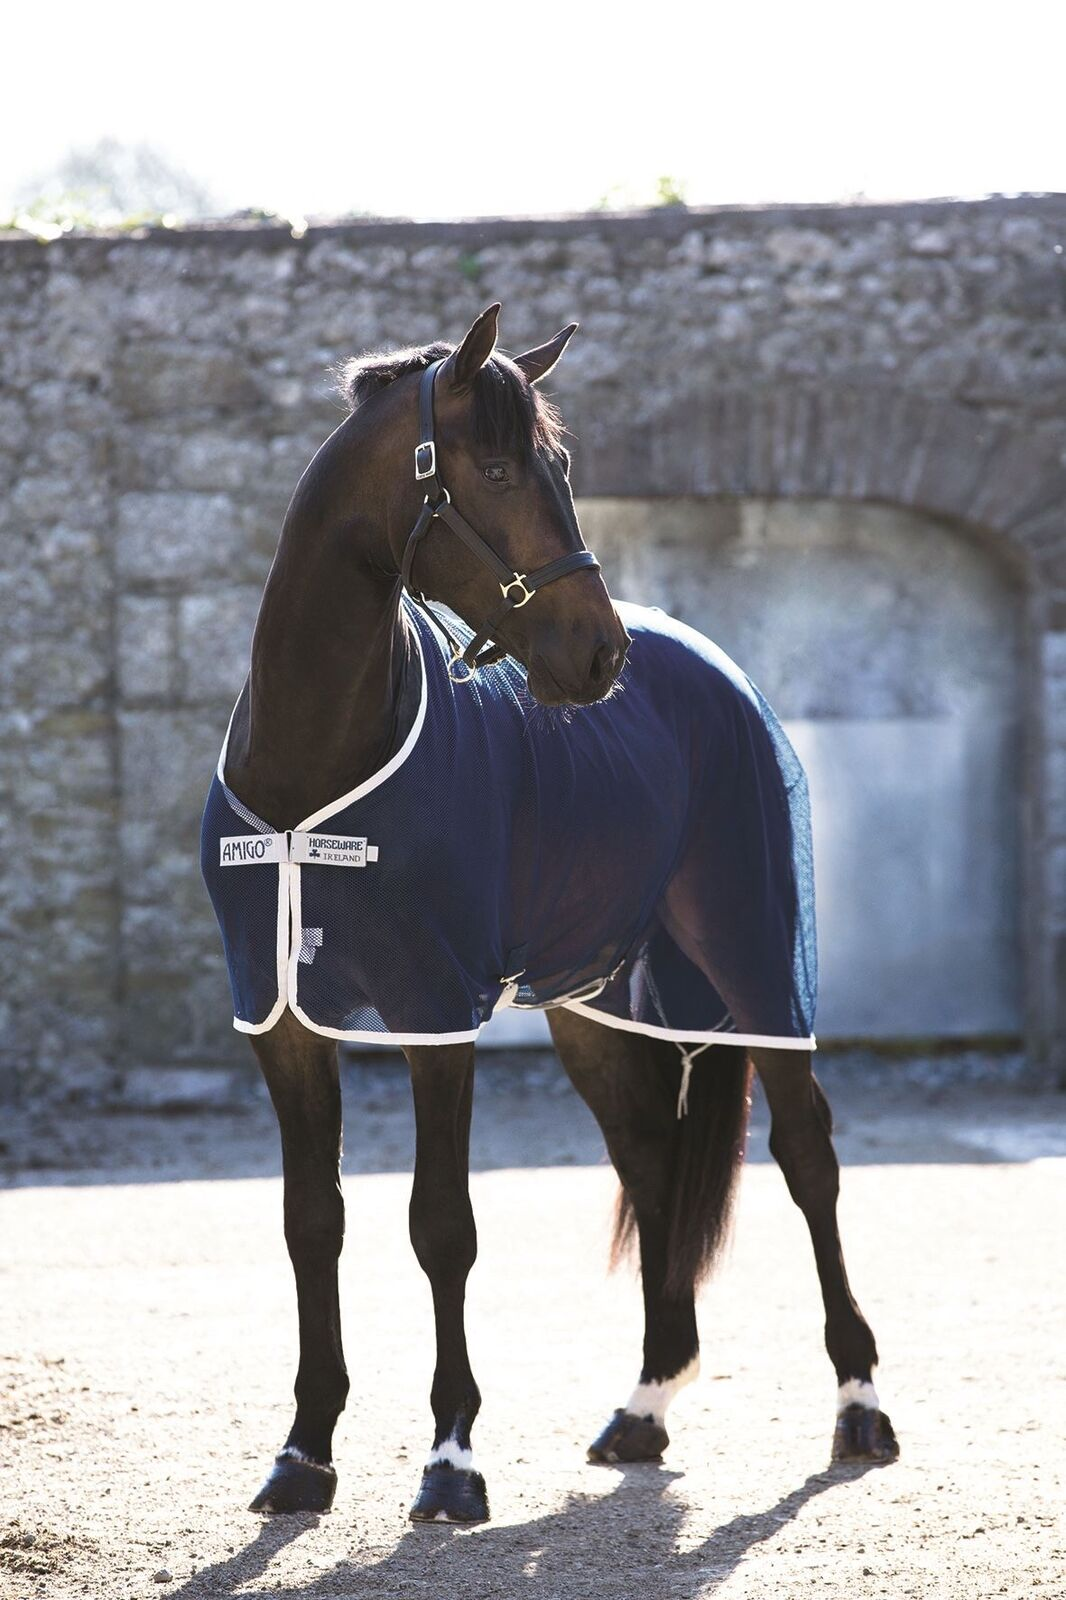 Horseware Ireland Amigo Net Cooler rem X Sur ACRN24